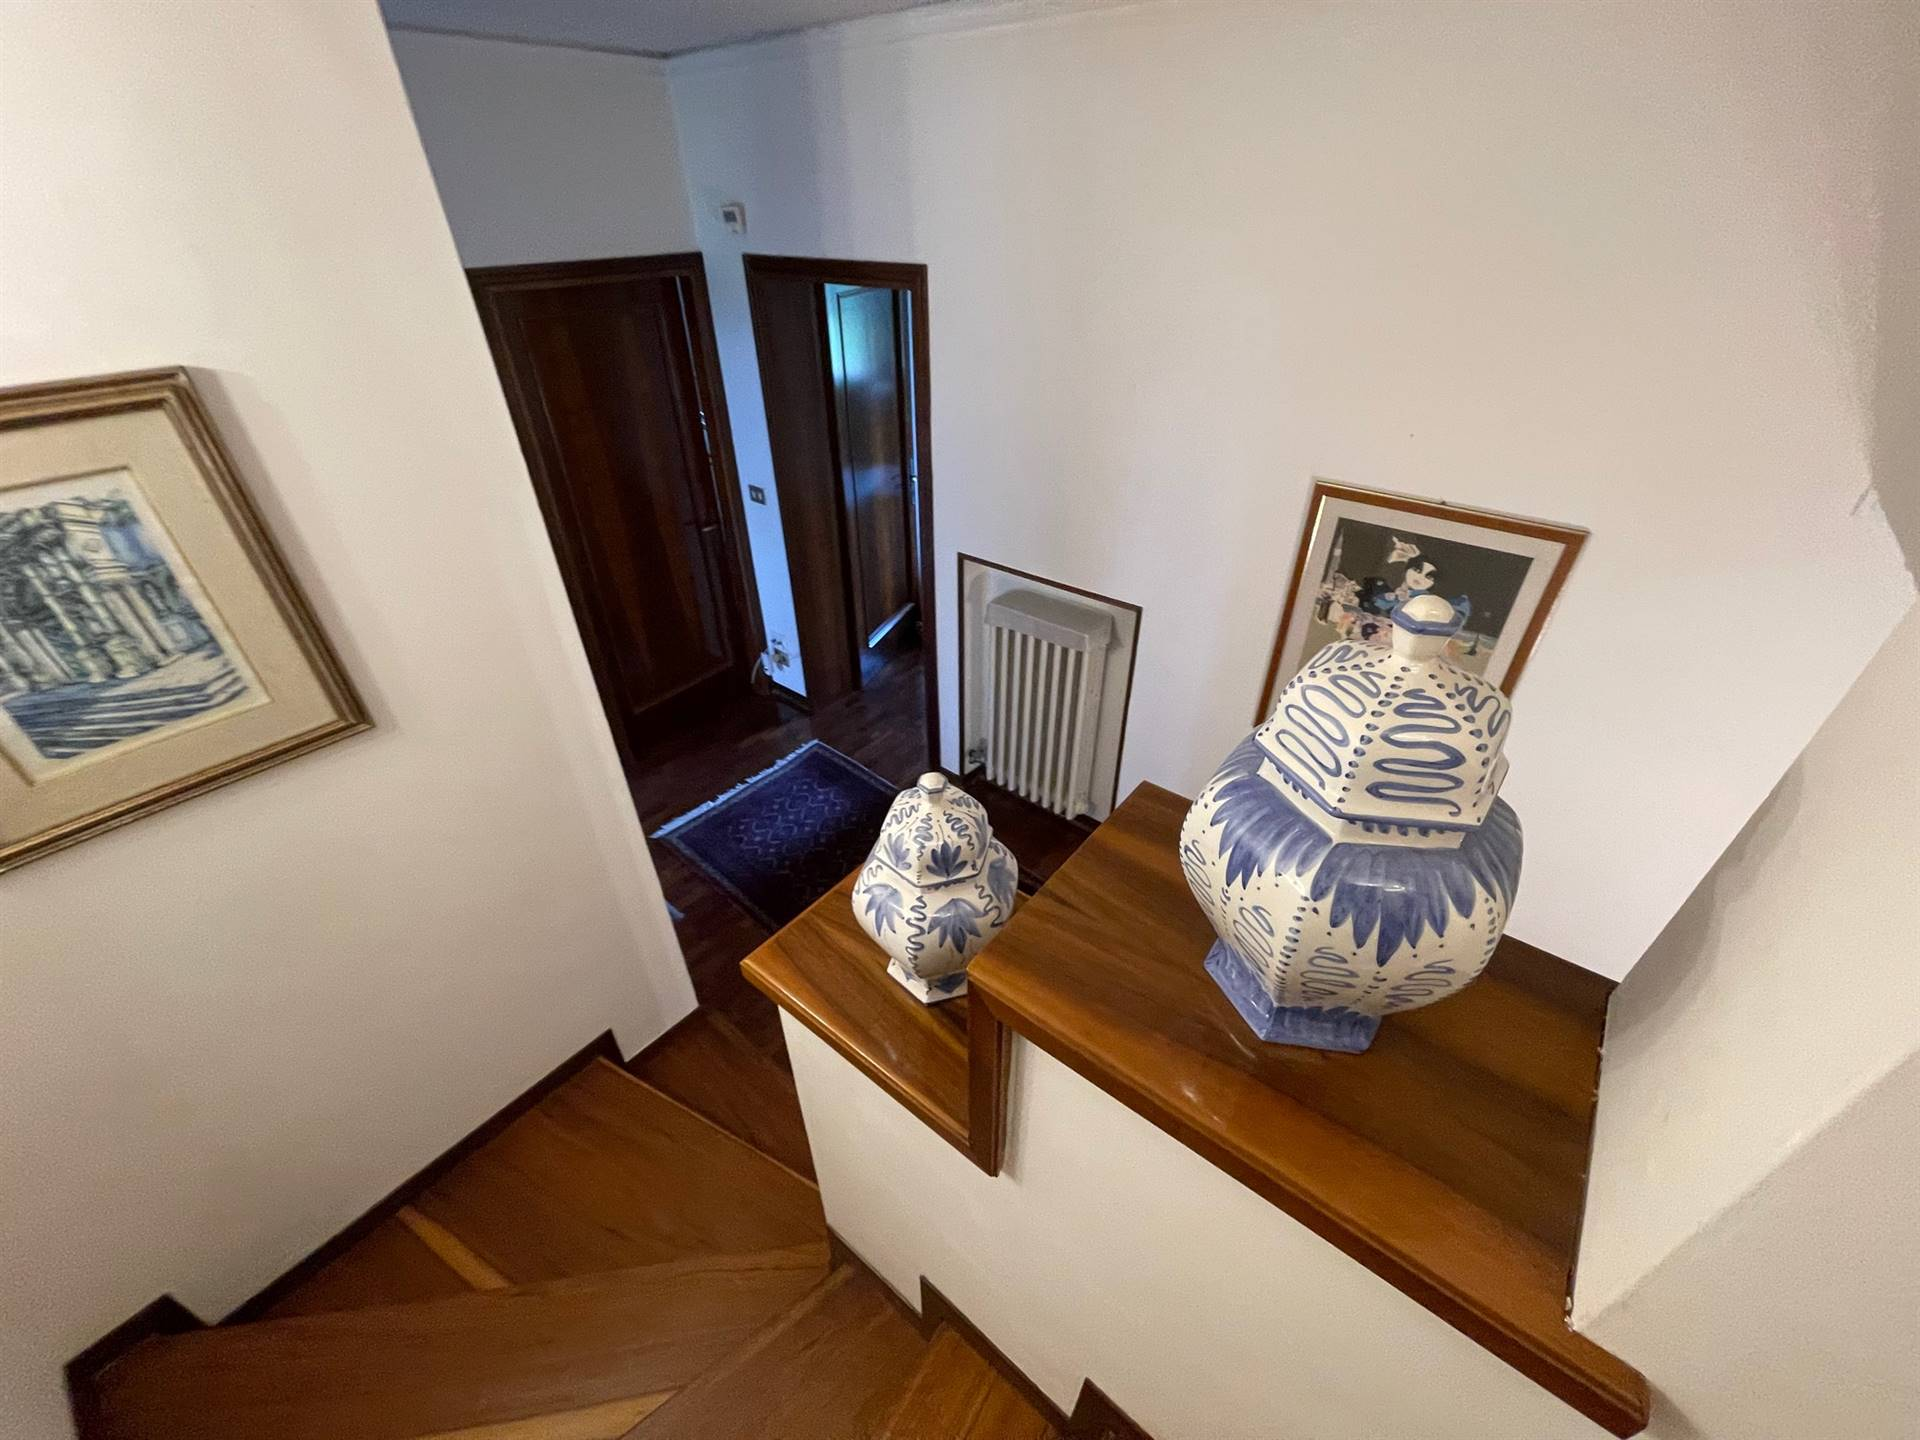 vano scale villa Zelarino euro 550.000